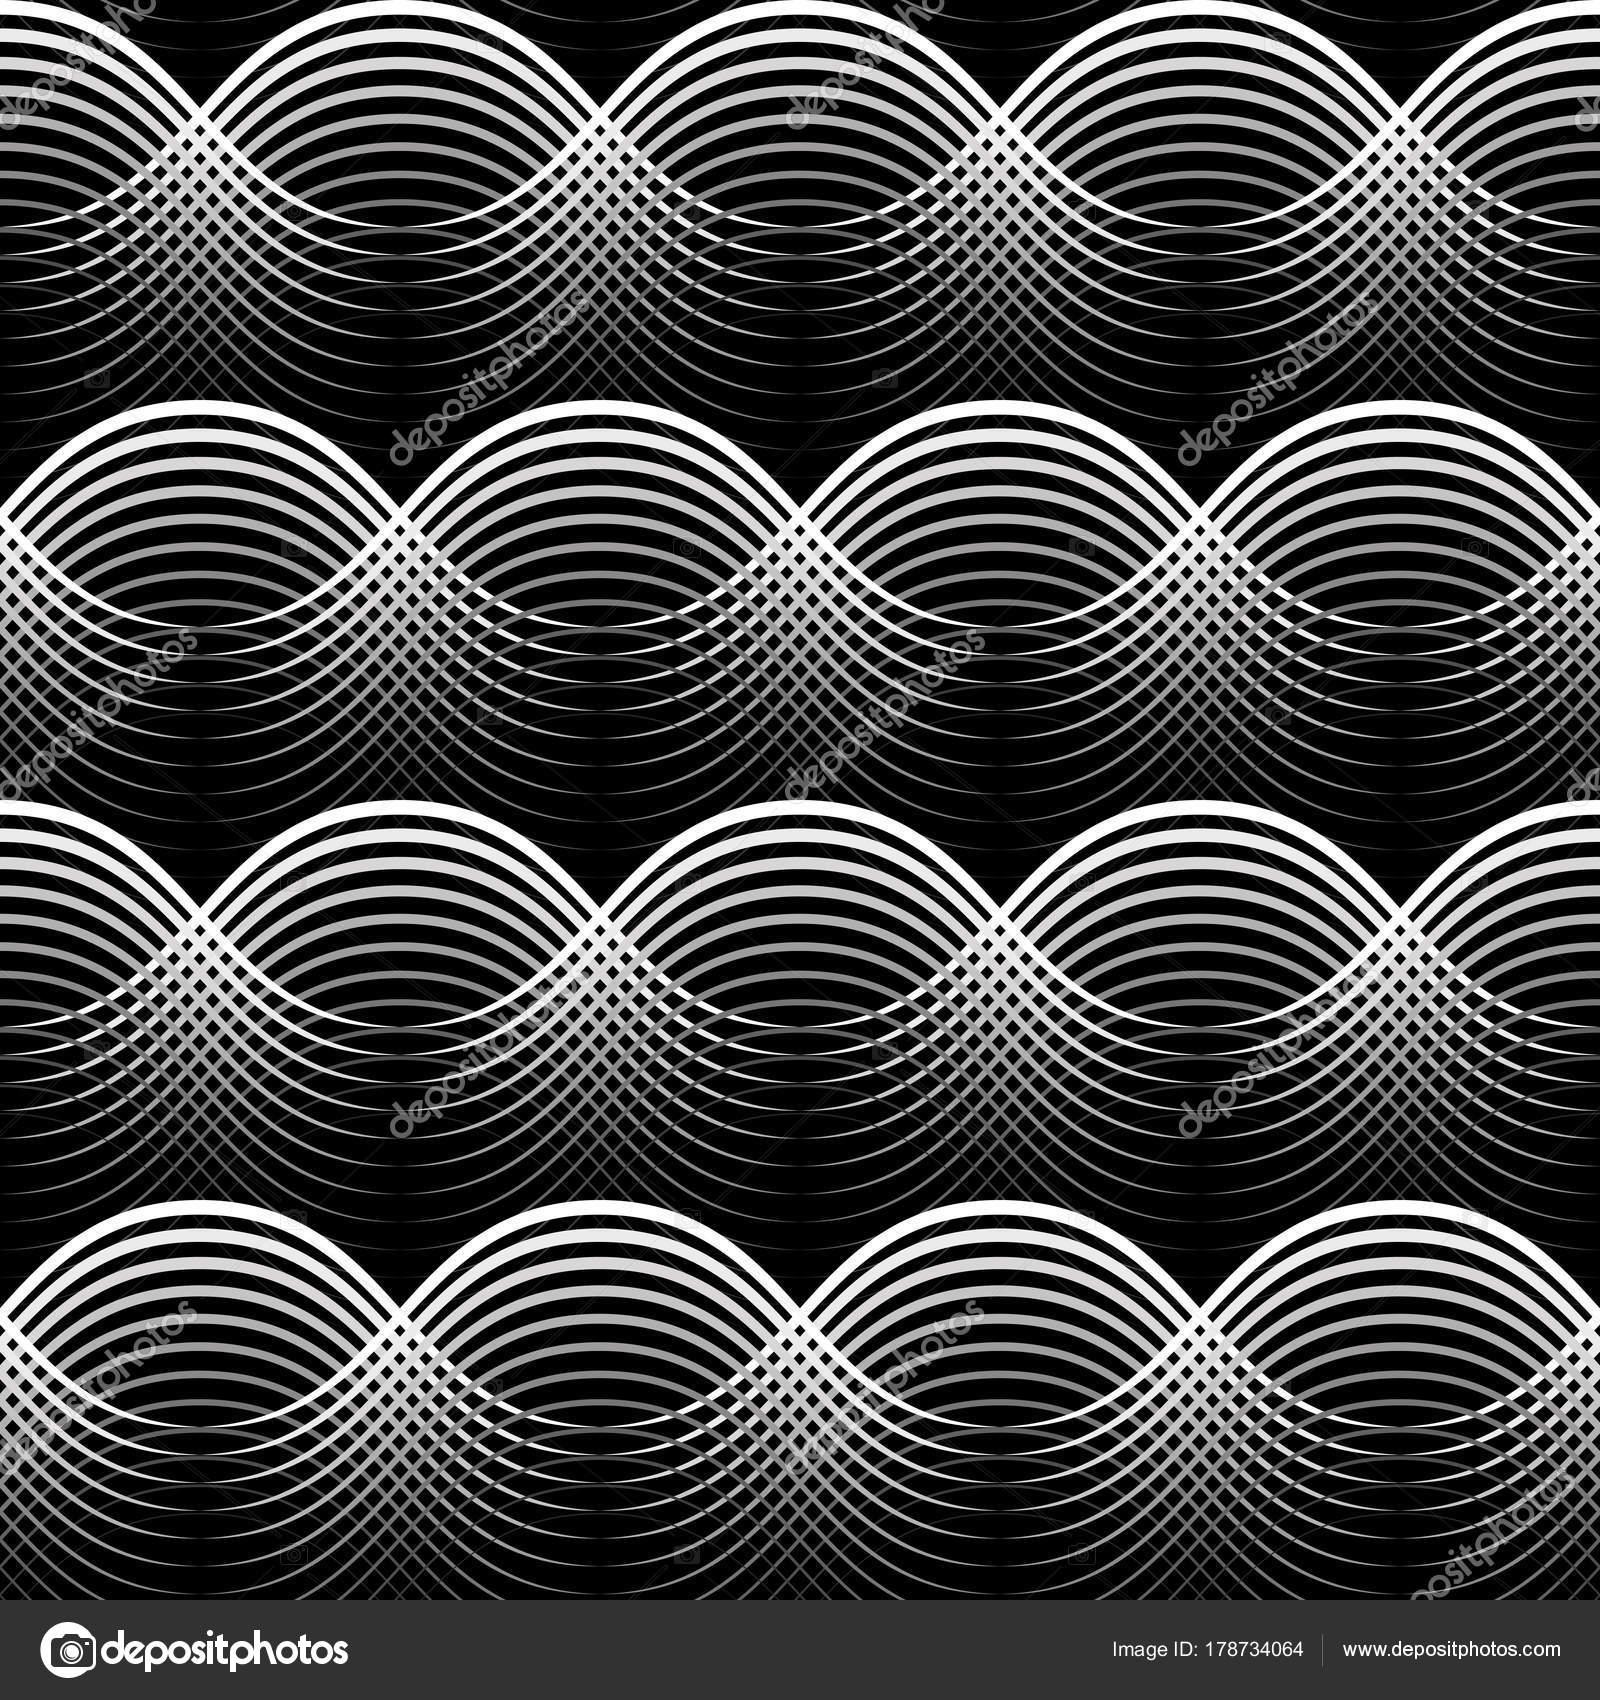 Simple Wallpaper High Resolution Geometric - depositphotos_178734064-stock-illustration-geometrical-seamless-pattern-black-waves  Perfect Image Reference_61971.jpg